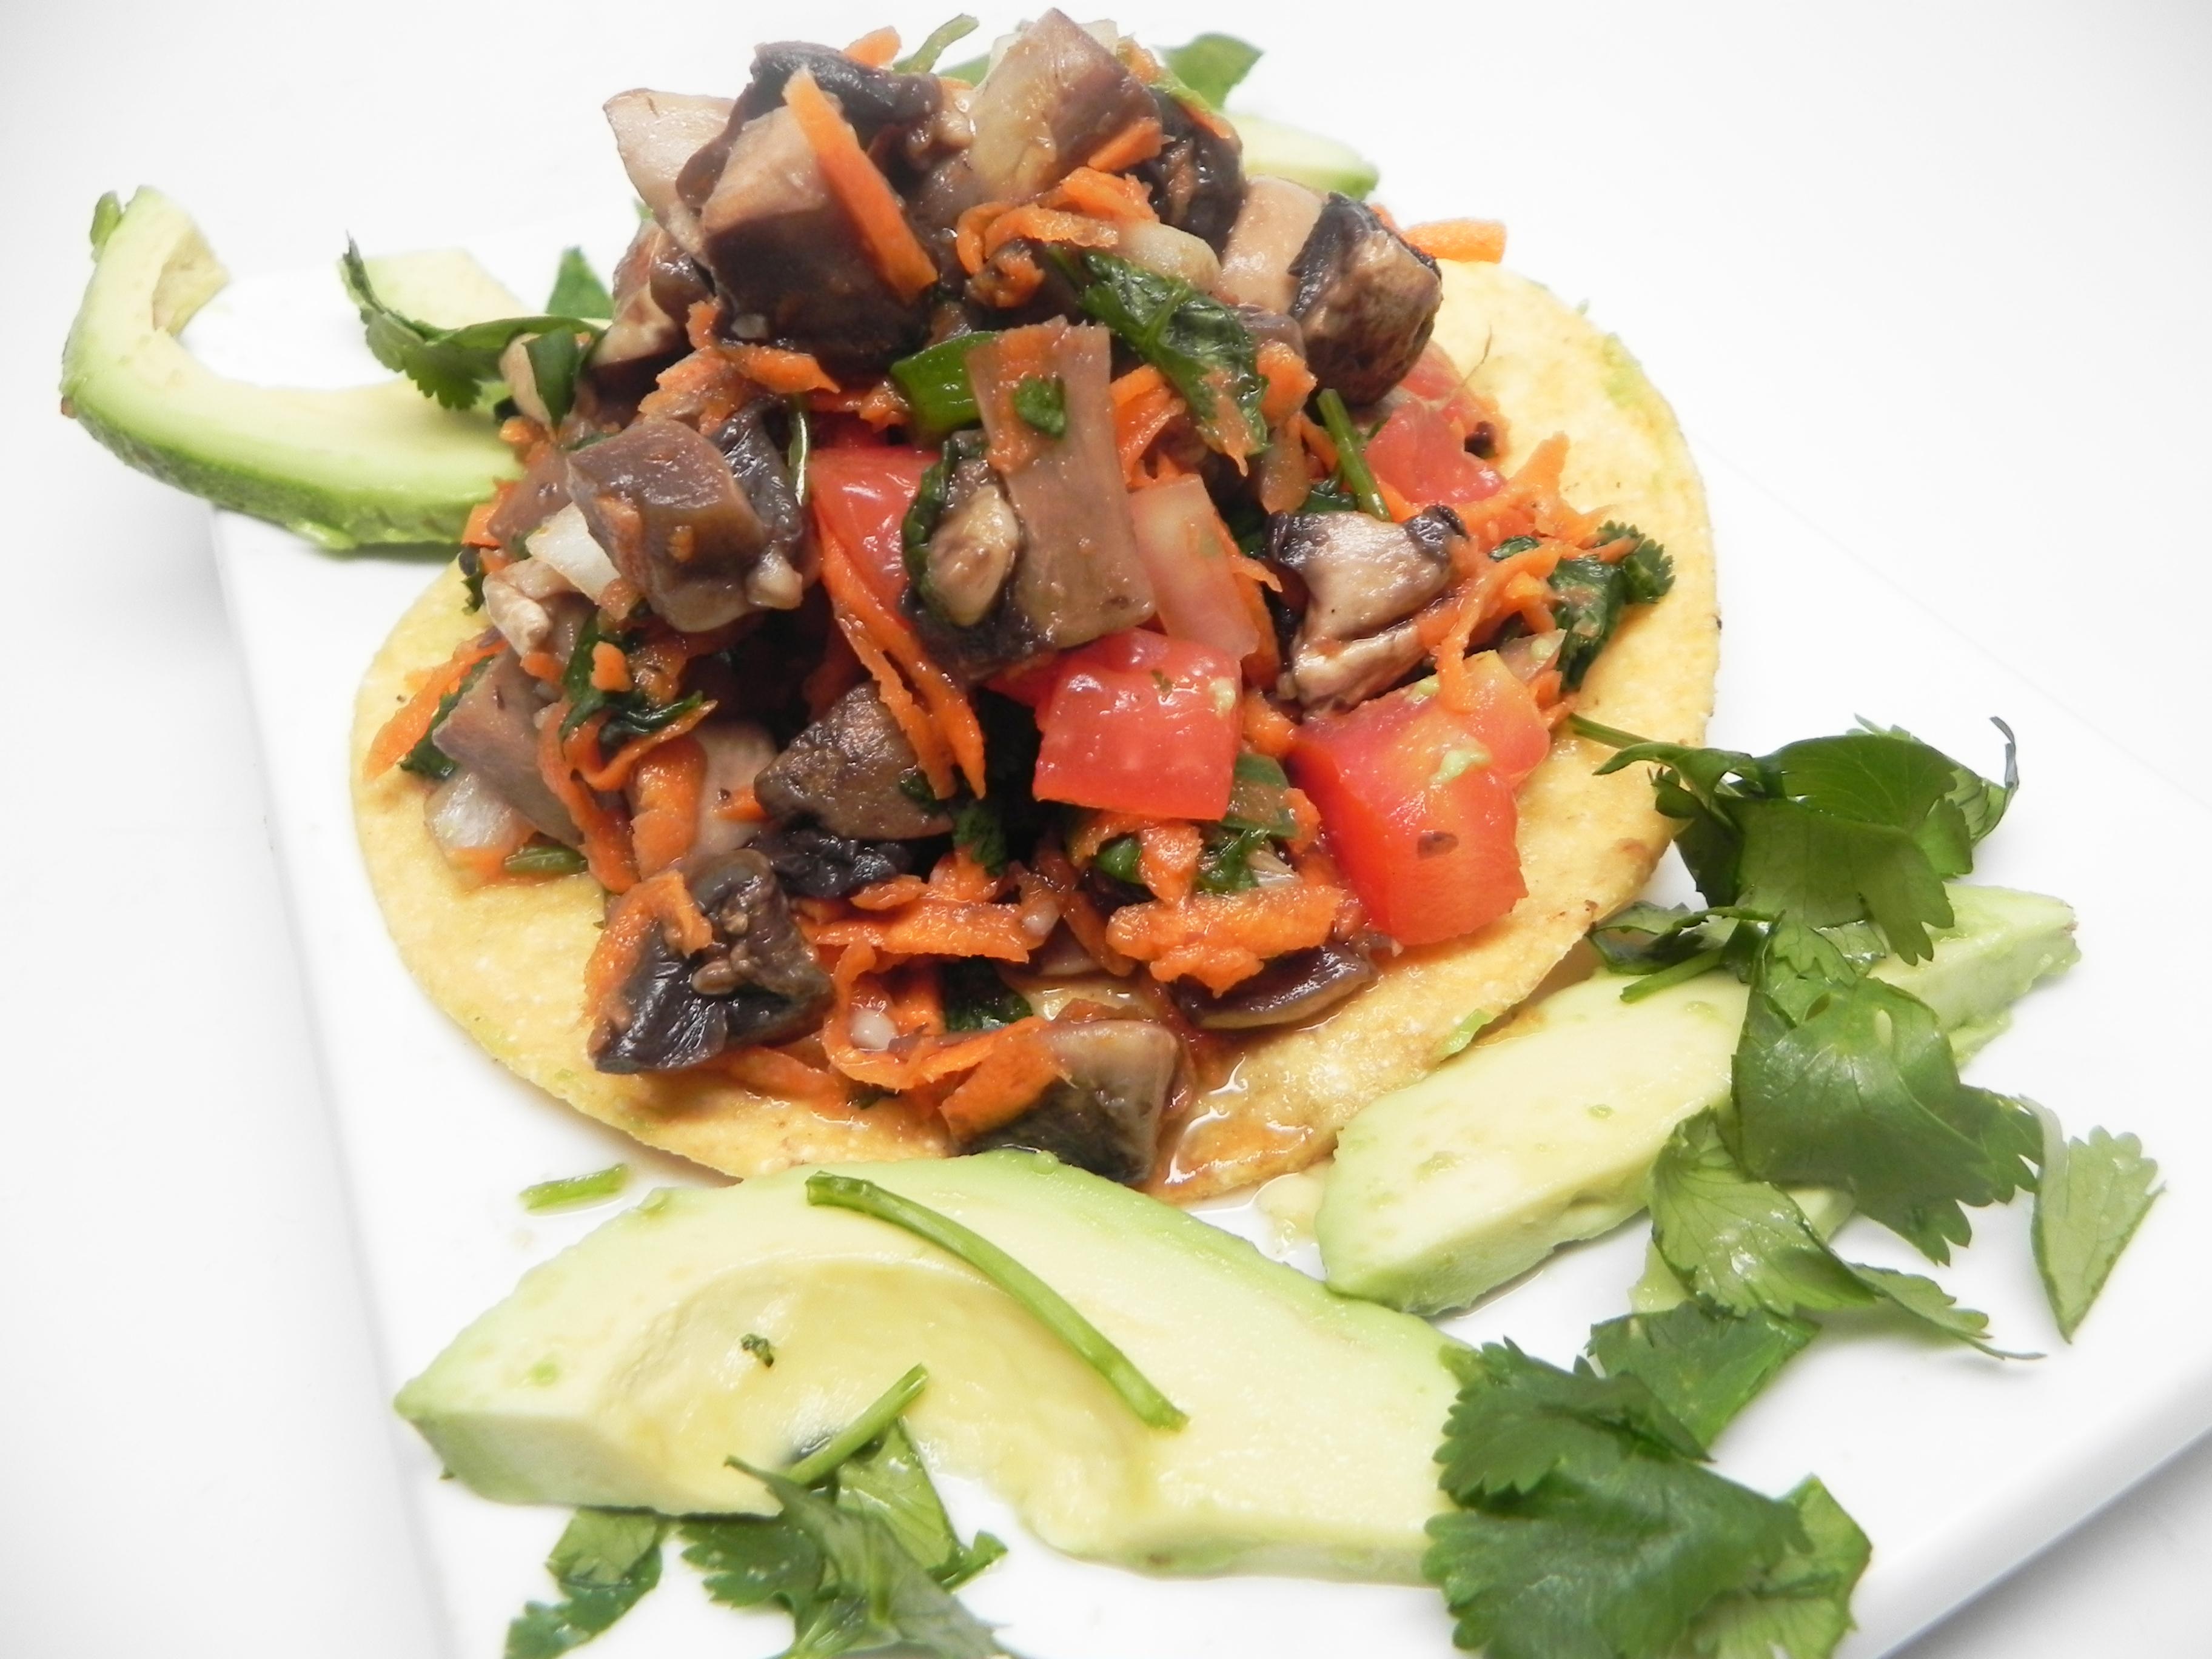 Vegan Mushroom Ceviche